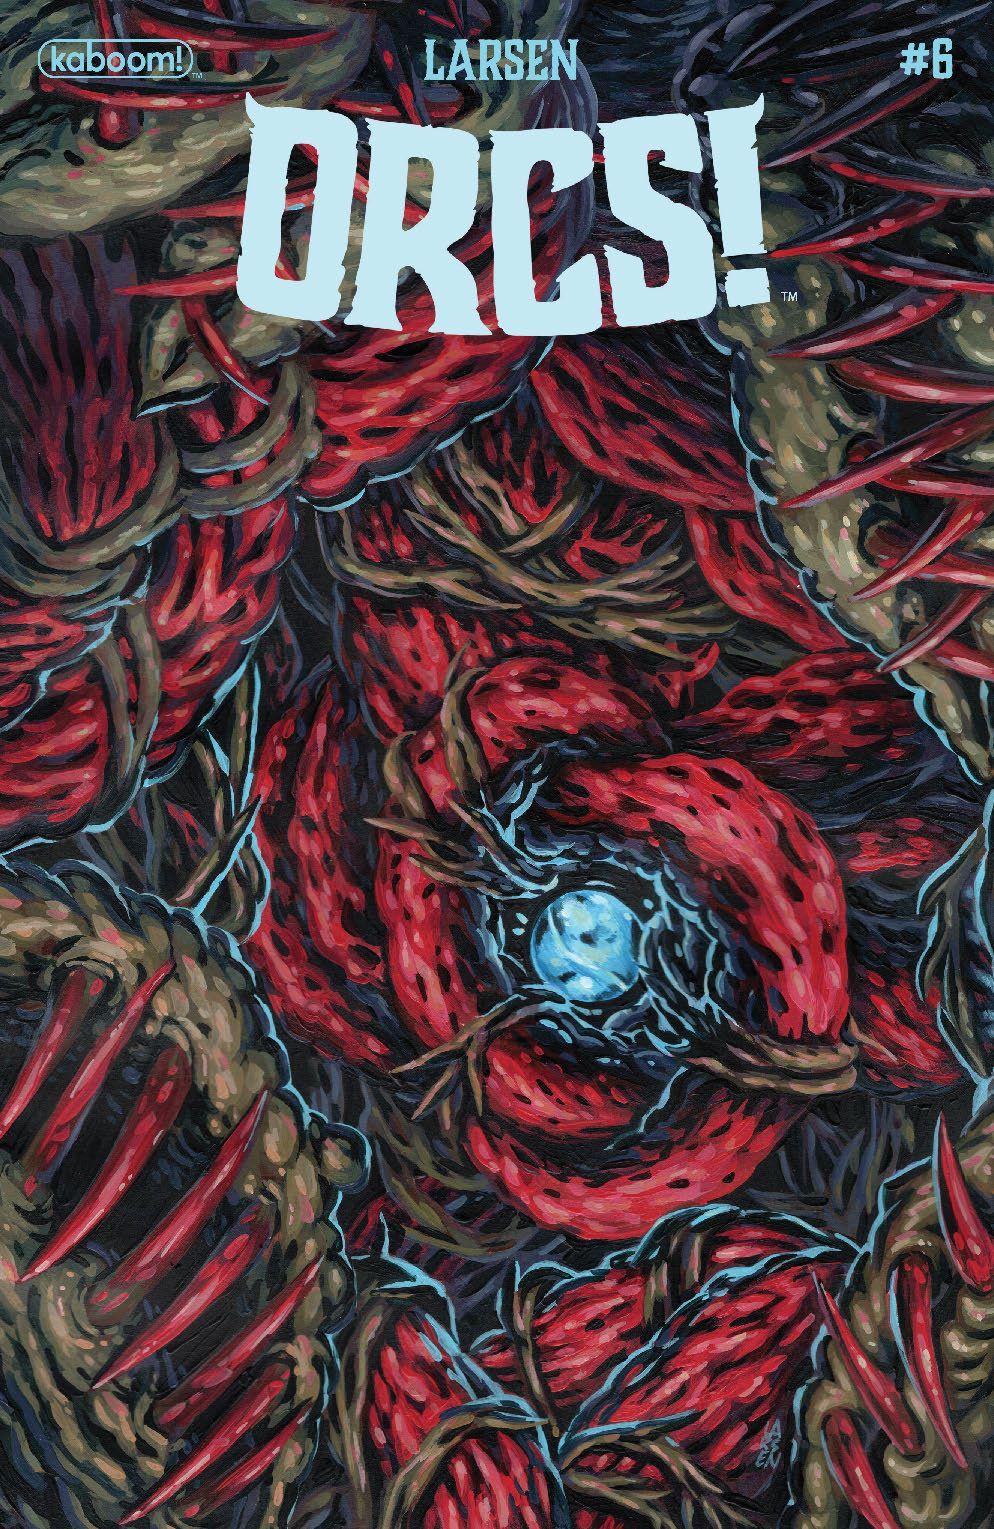 Orcs_006_Cover_A_Main ComicList Previews: ORCS #6 (OF 6)